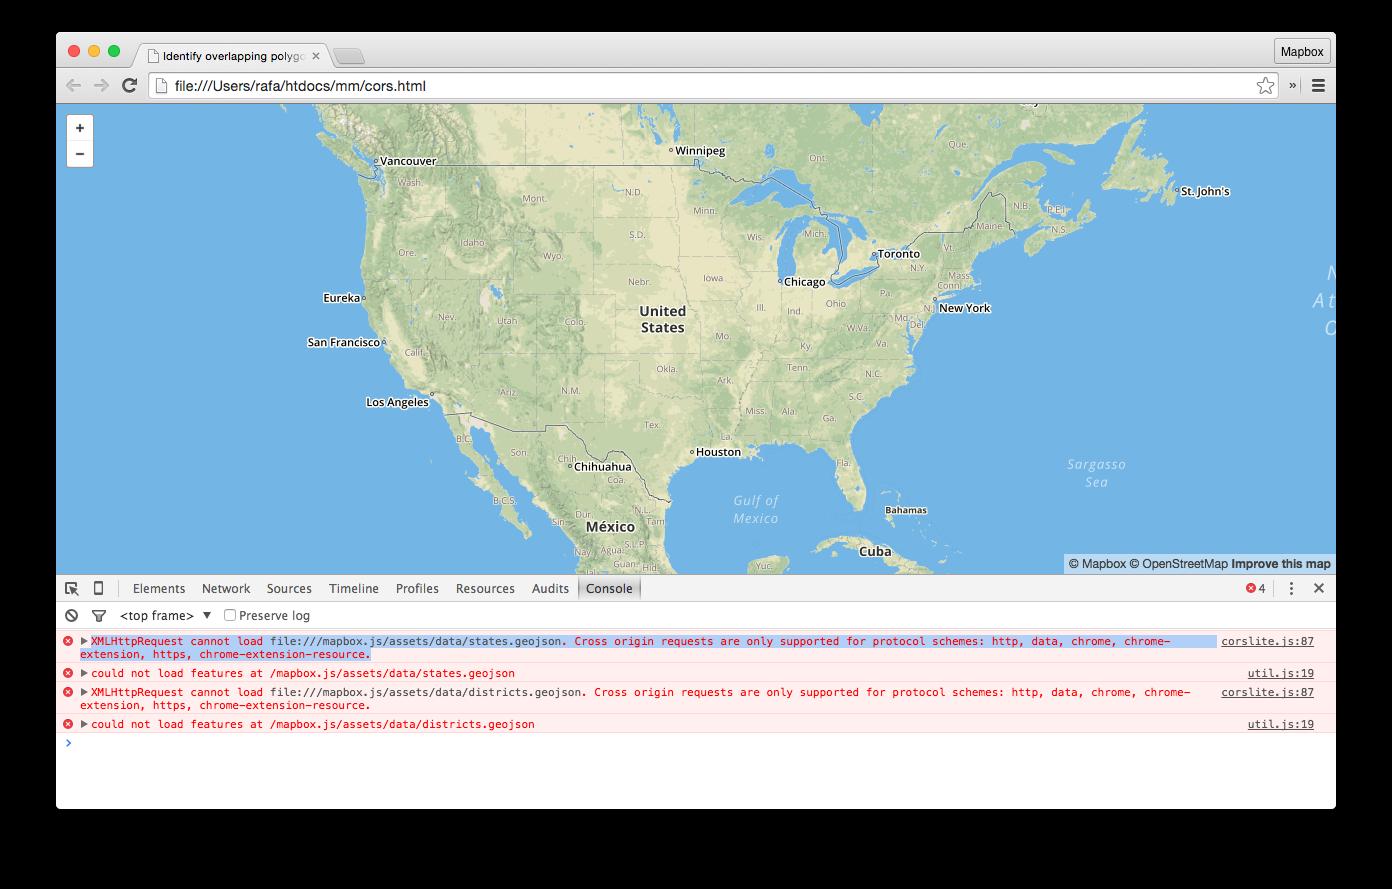 CORS errors | Help | Mapbox